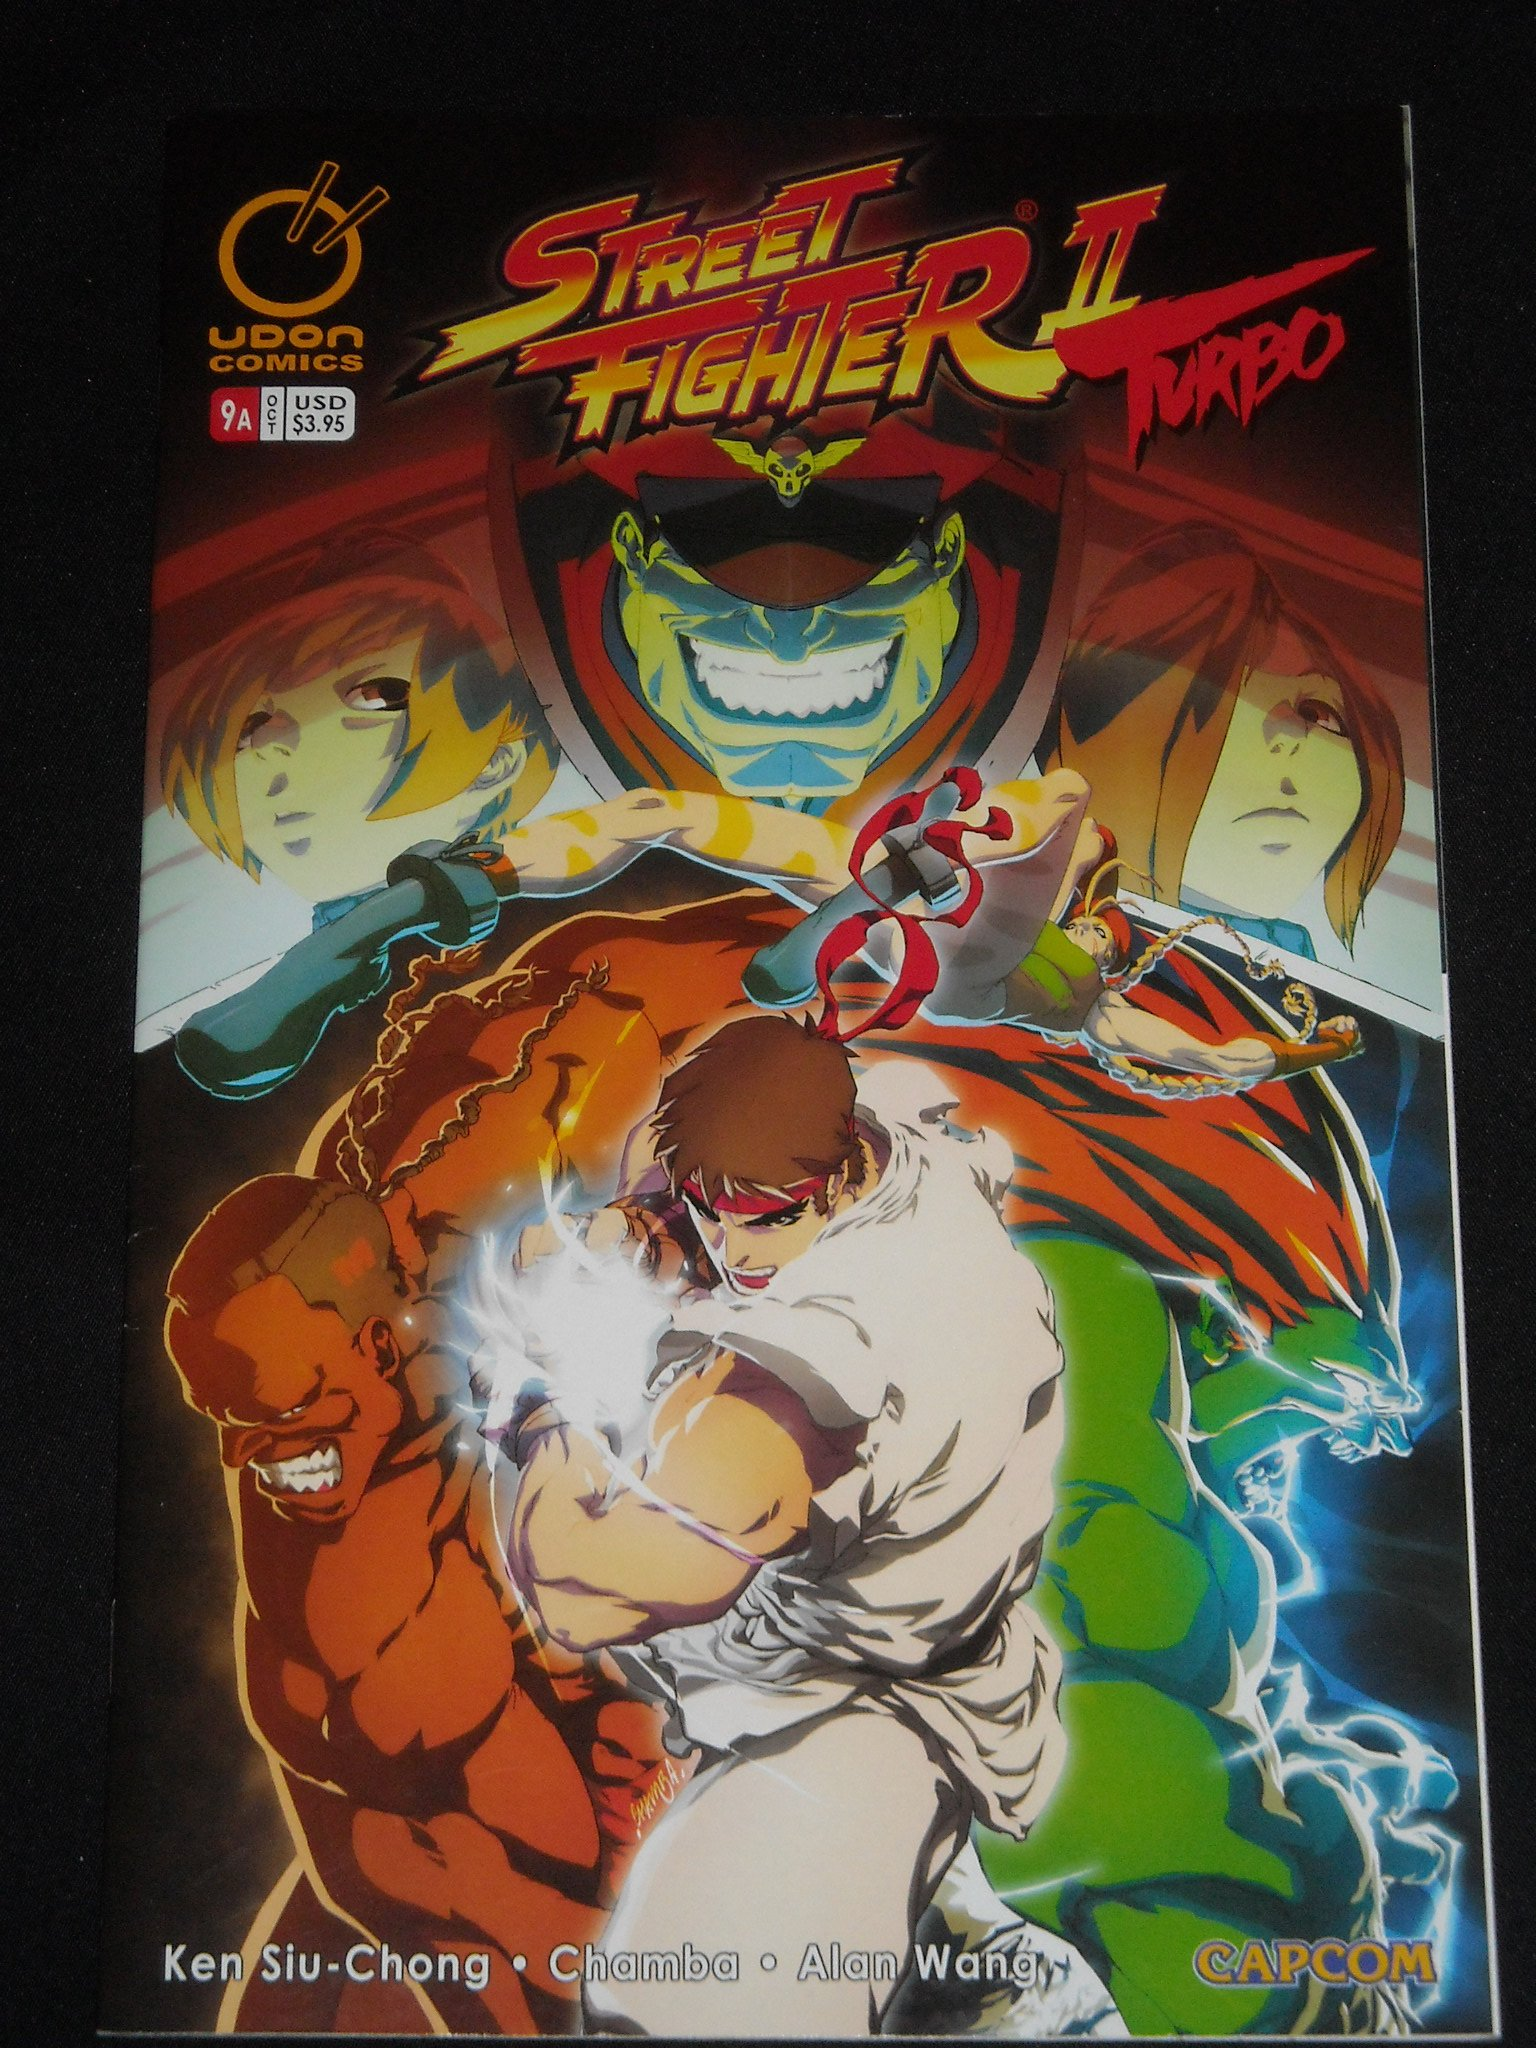 Street Fighter 2 Turbo 9 Cover A Bisen Ken Ryu Street